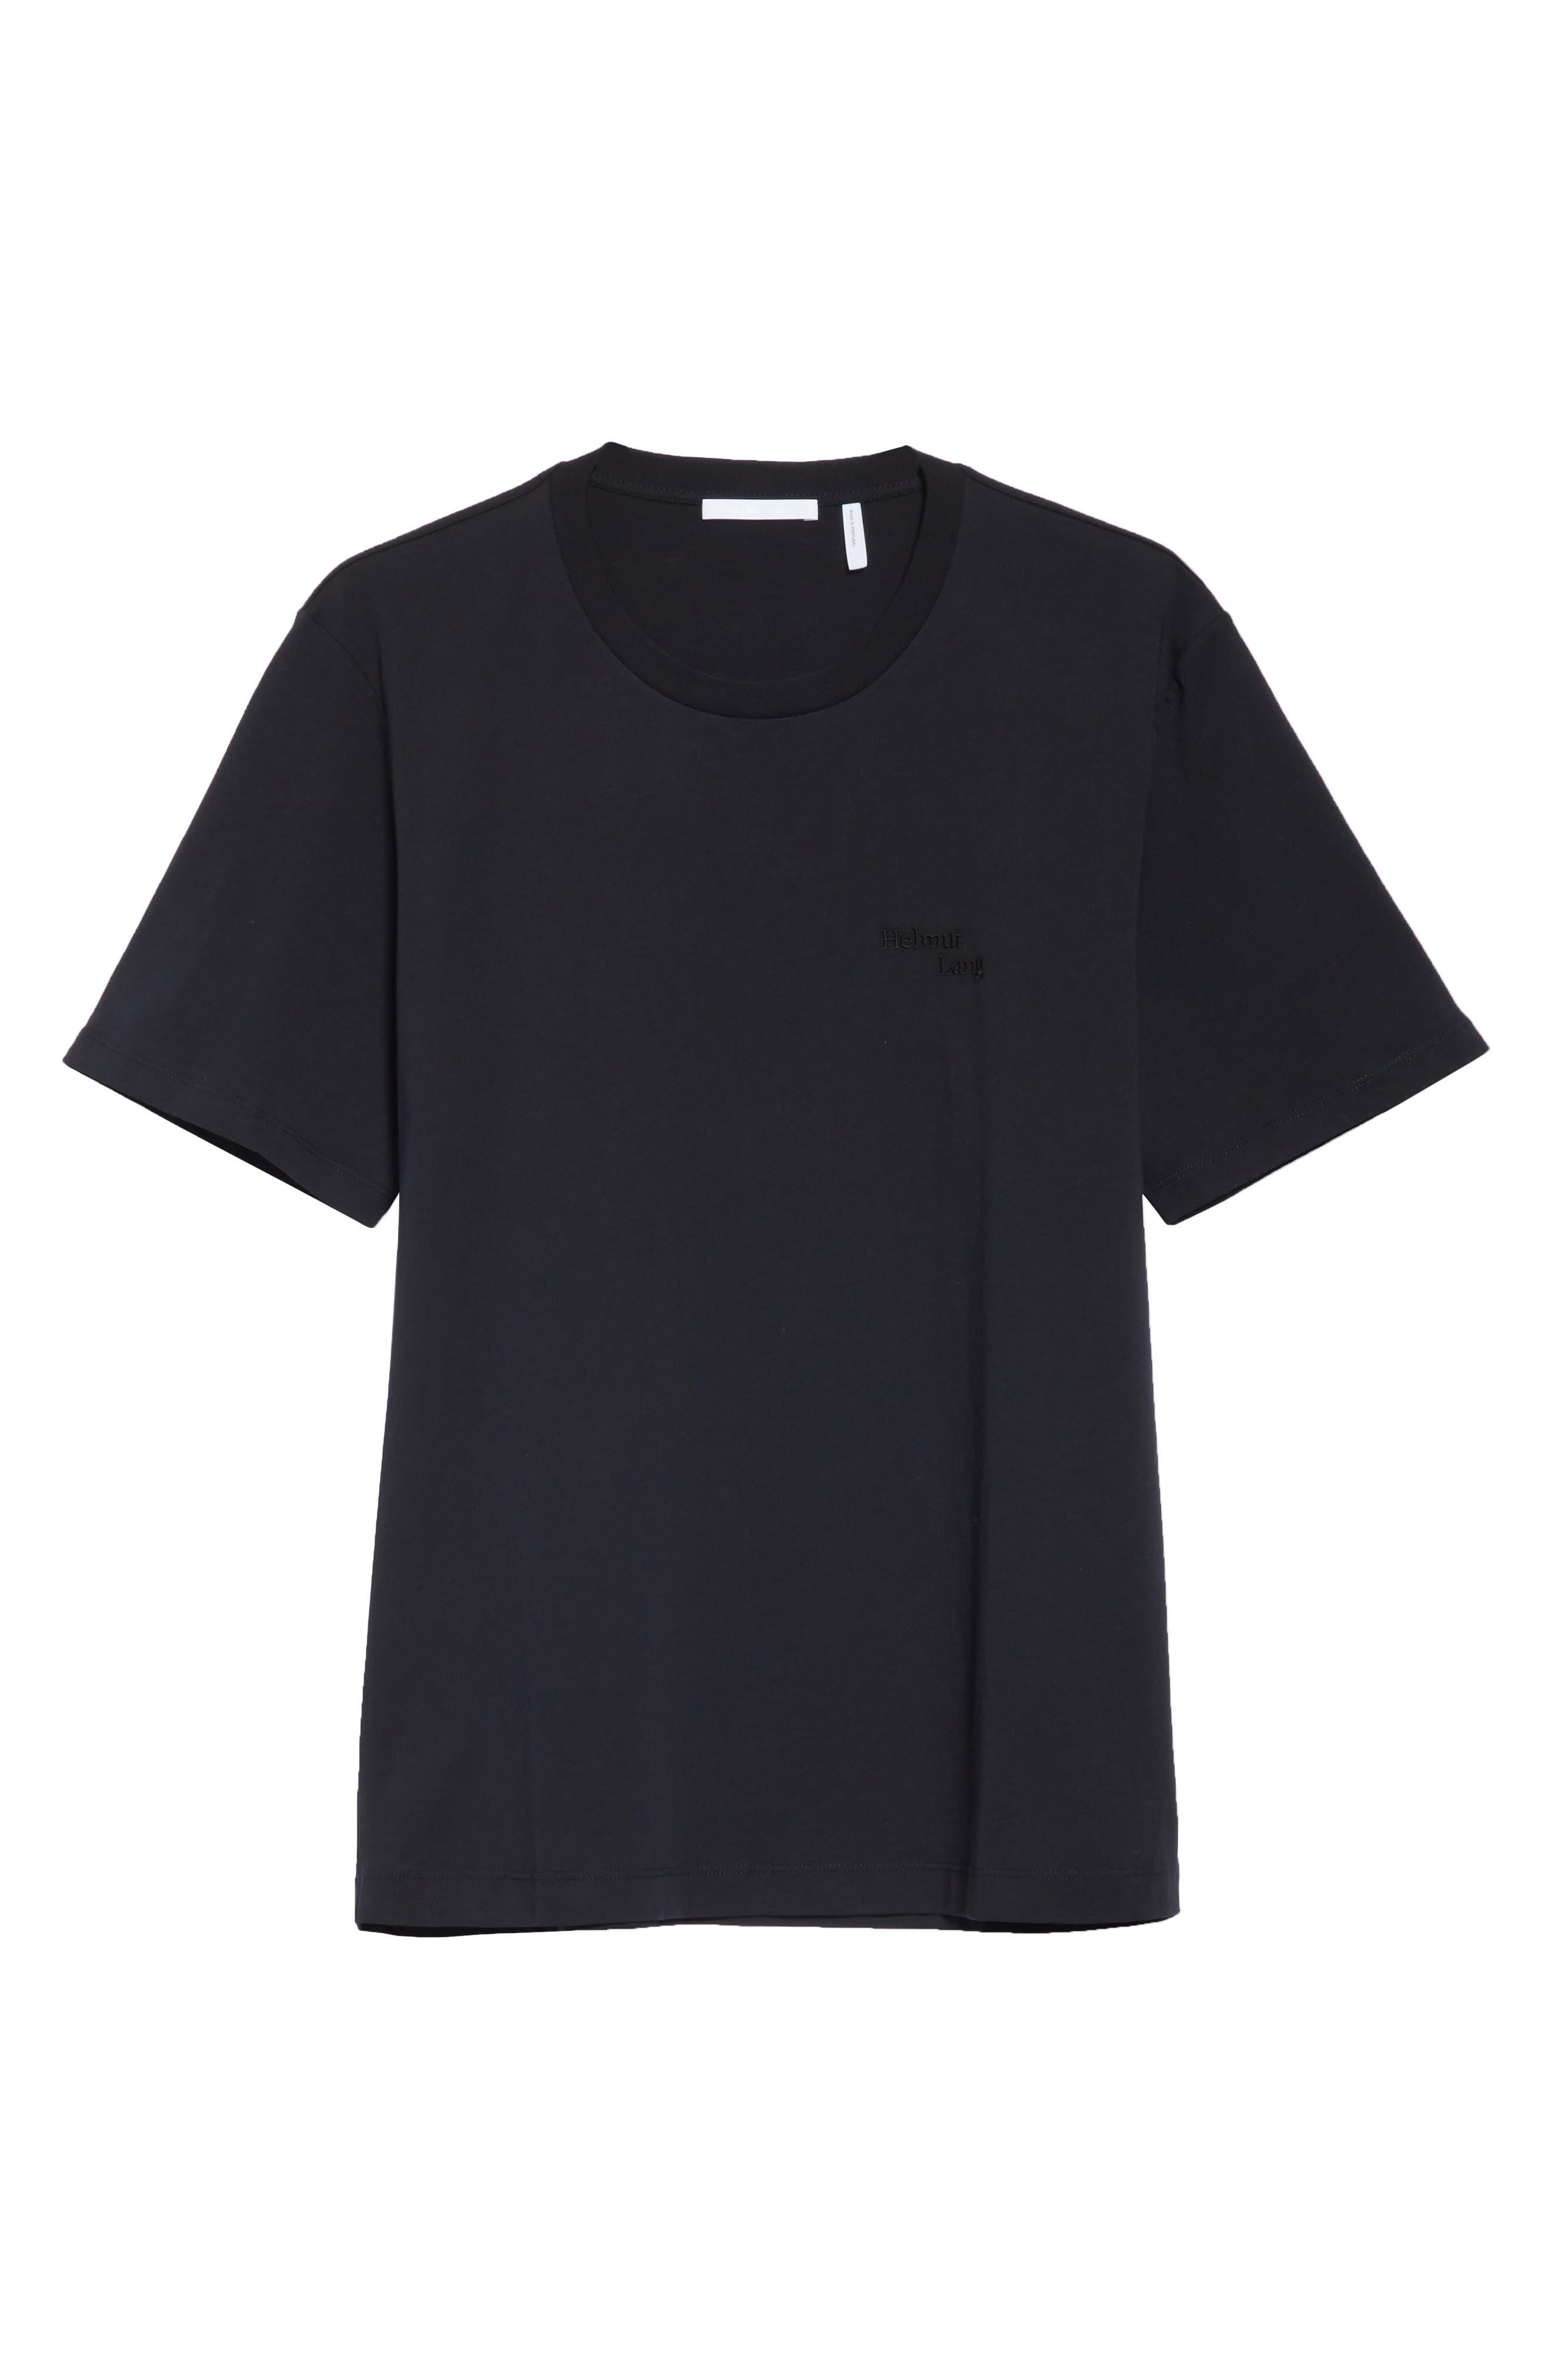 HELMUT LANG, Stacked Logo T-Shirt, Alternate thumbnail 6, color, BLACK BASALT